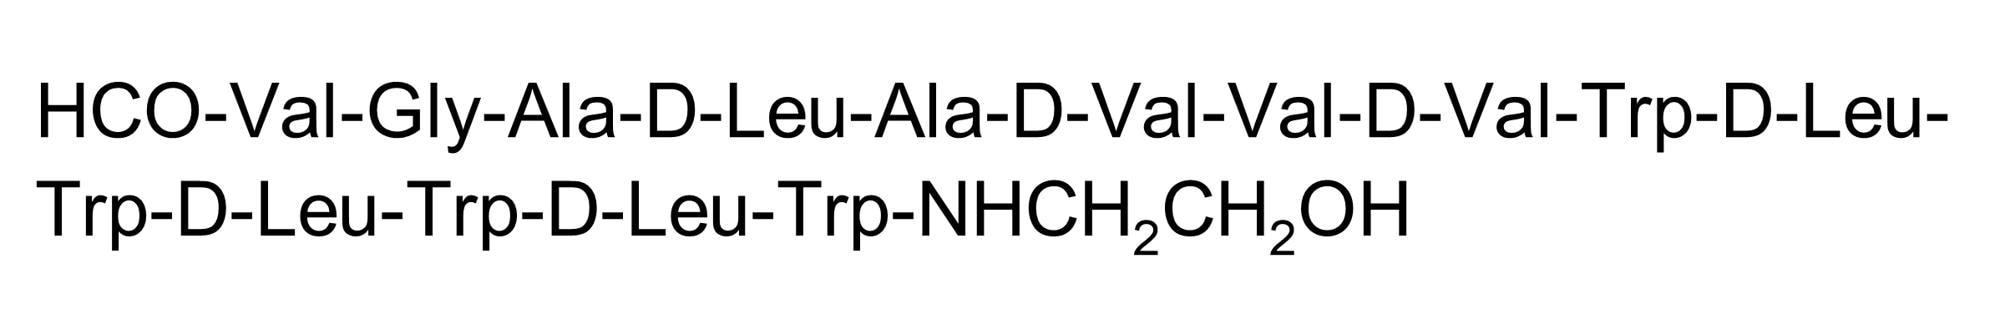 Chemical Structure - Gramicidin A, Antibiotic agent (ab144510)